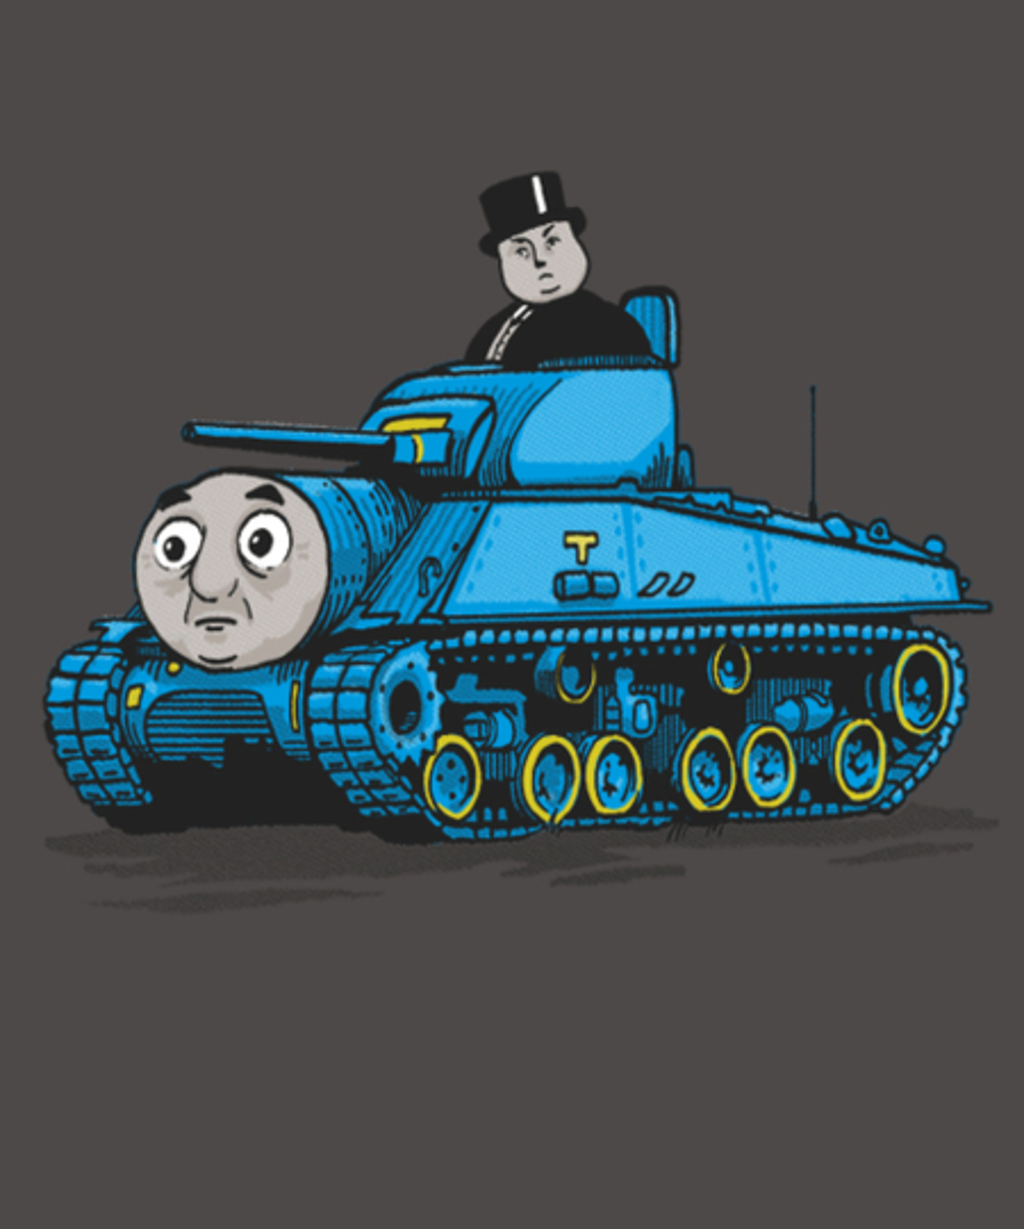 Qwertee: Thomas The Tank